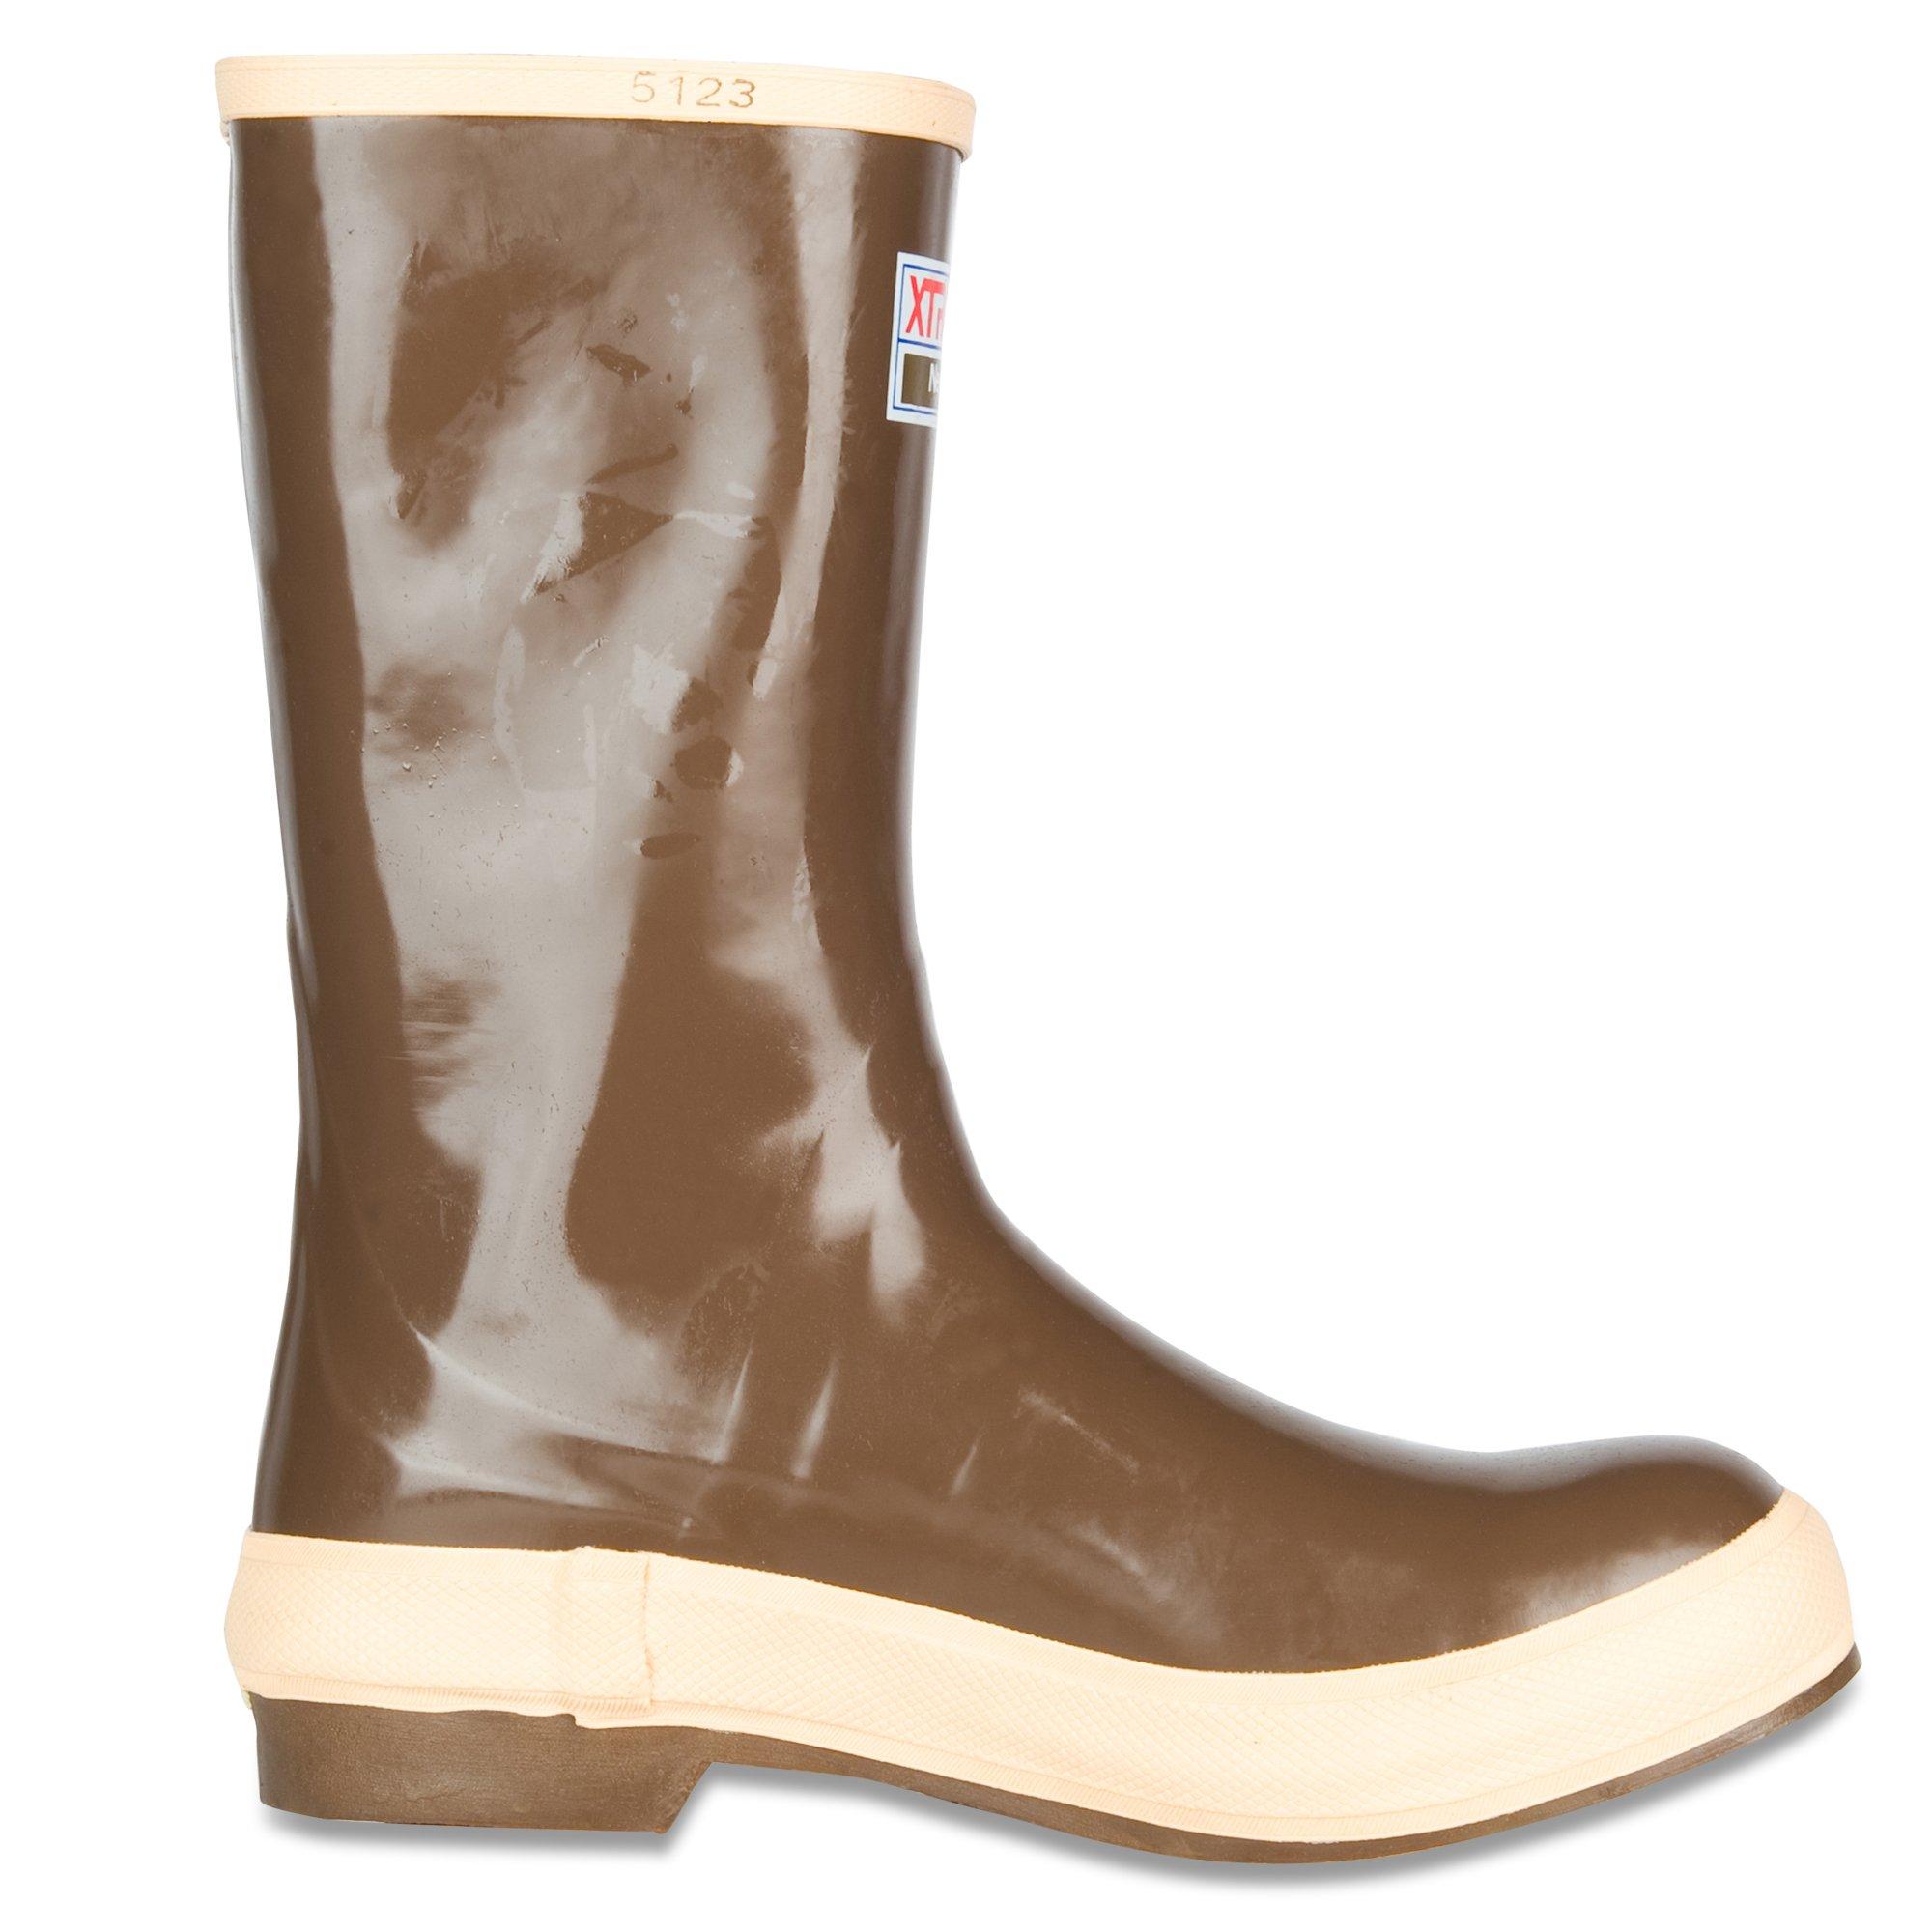 XTRATUF Legacy Series 12'' Camo-Lined Neoprene Men's Fishing Boots, Copper & Tan (22834G) by Xtratuf (Image #6)